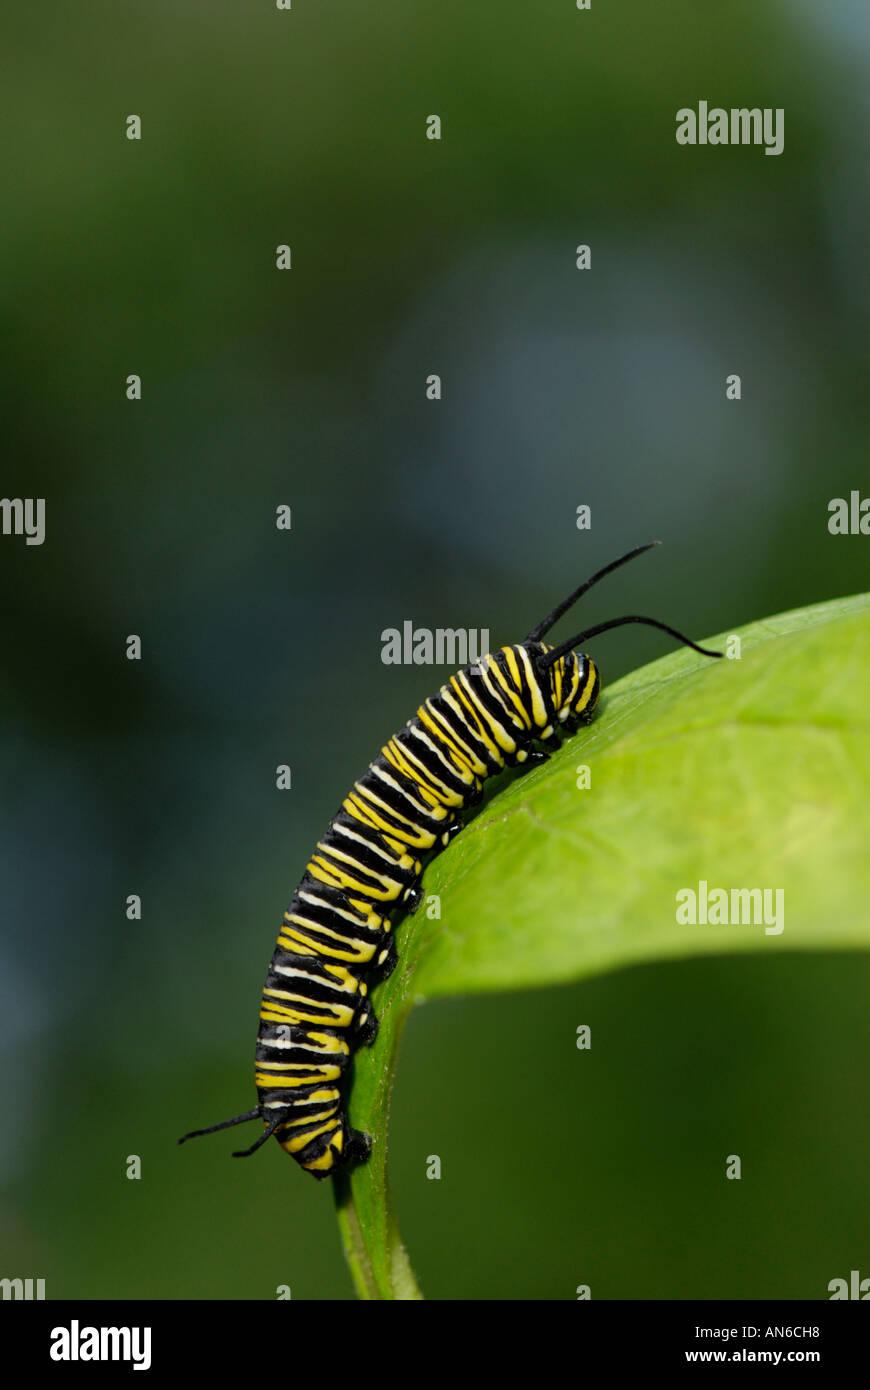 Aposematic Coloration Stockfotos & Aposematic Coloration Bilder - Alamy